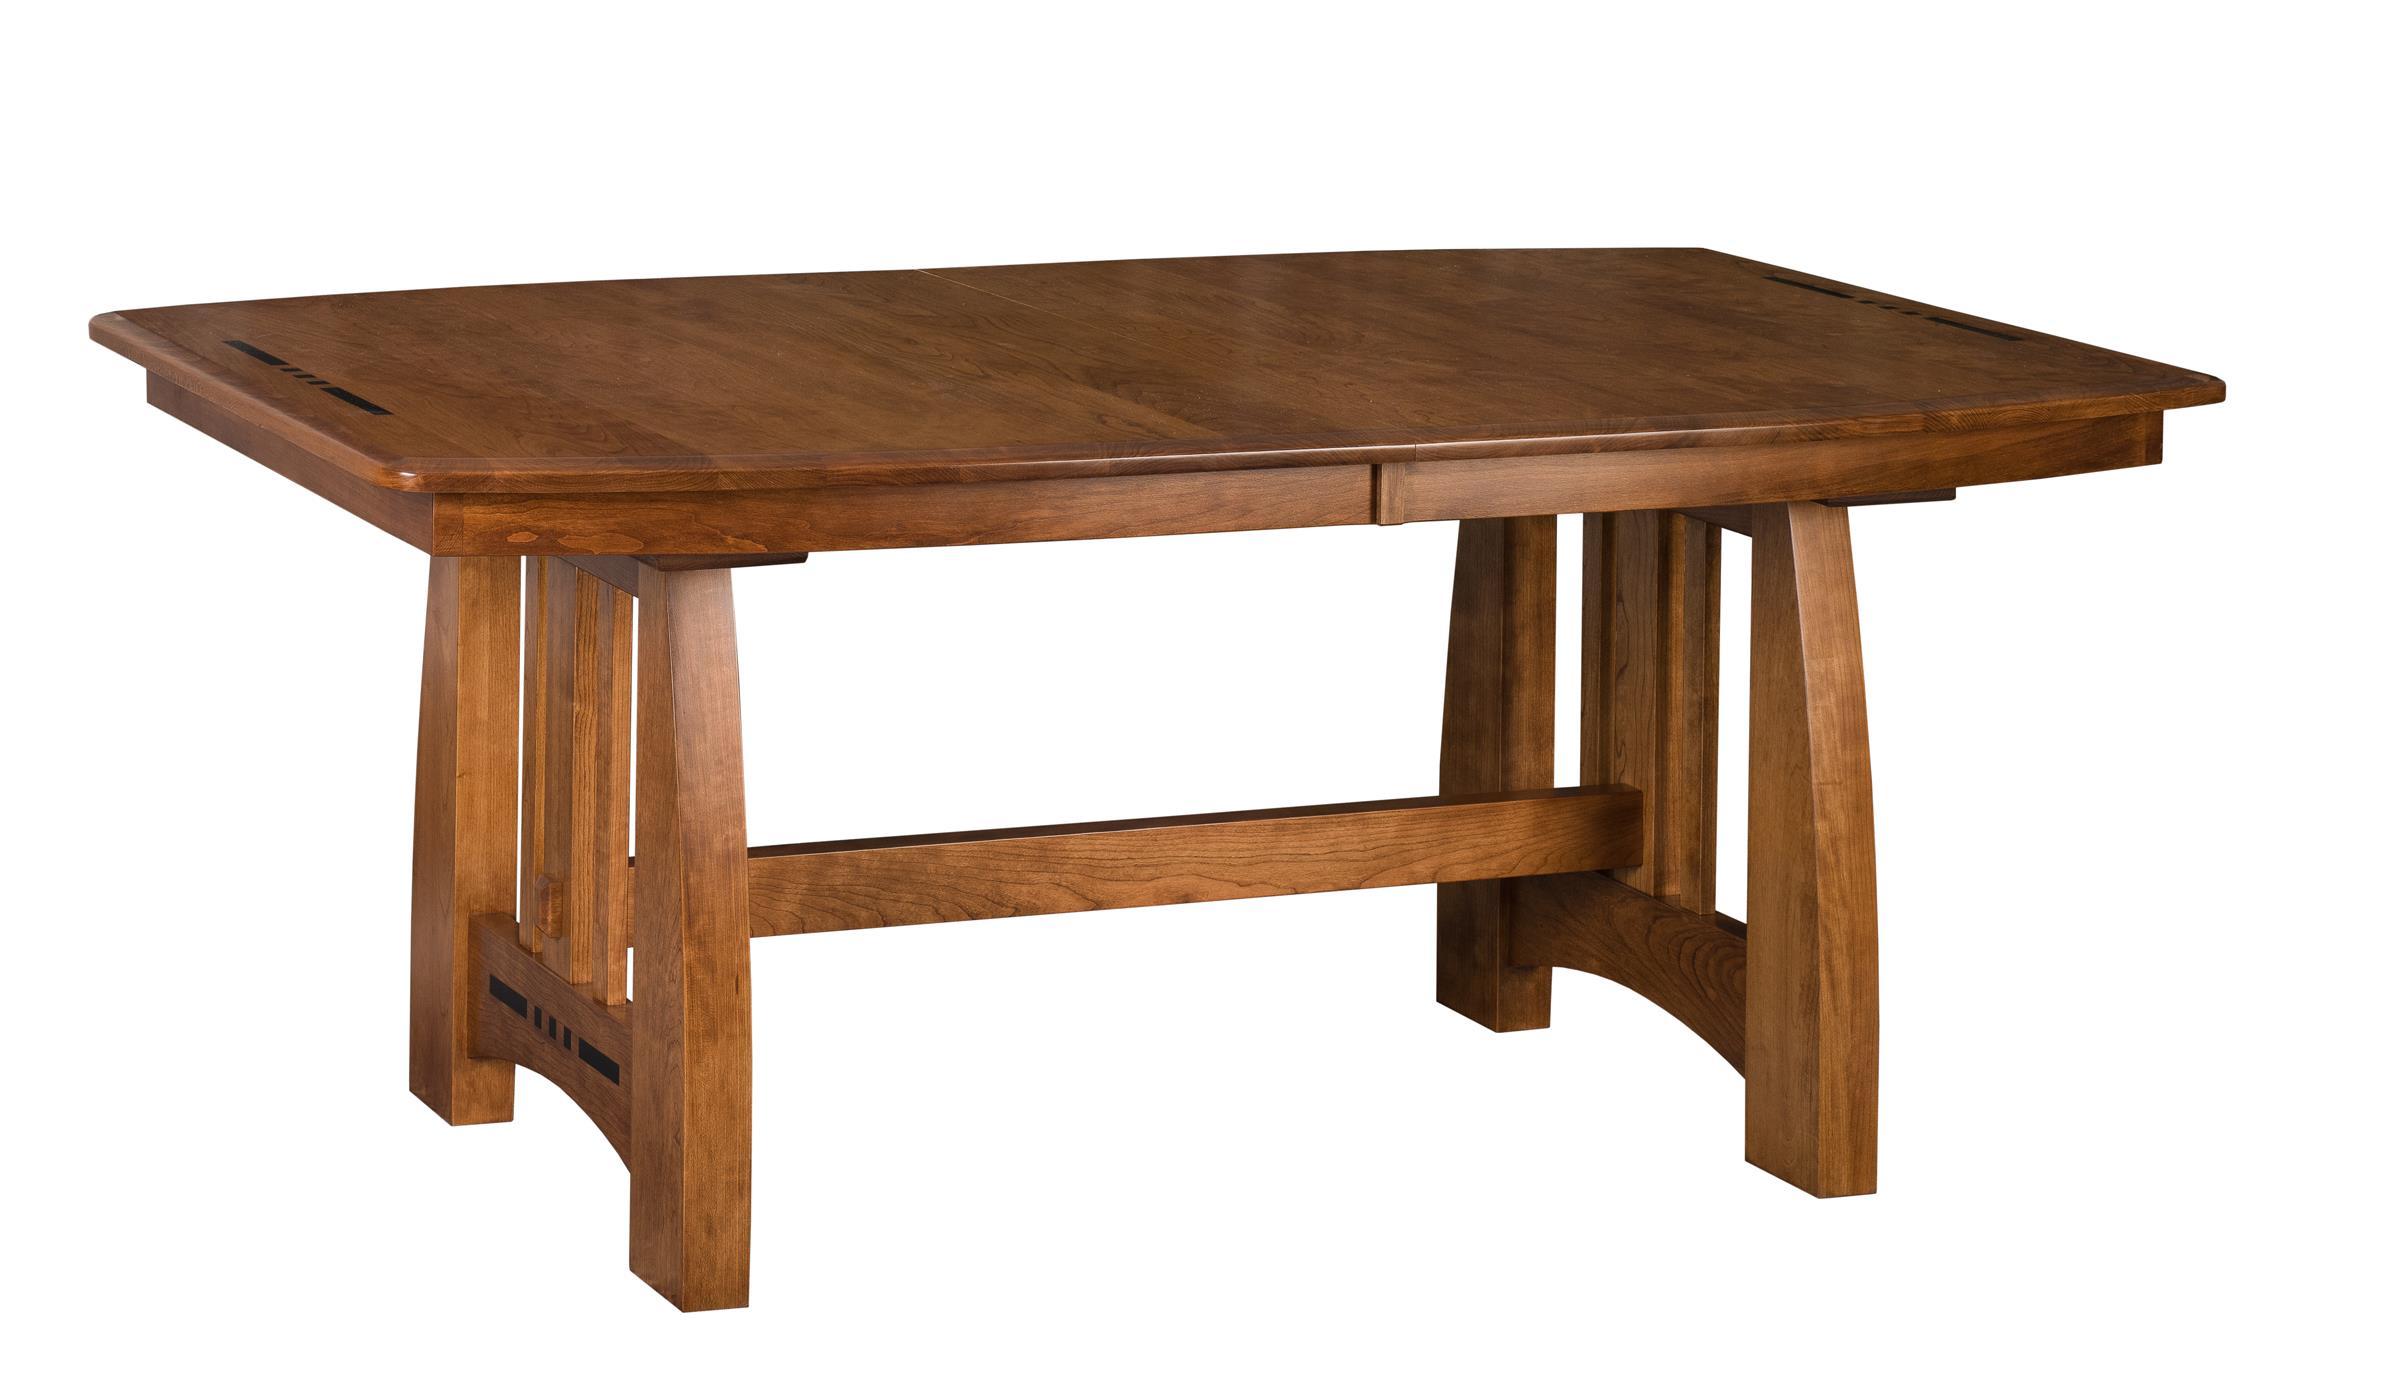 Hayworth Dining Table at Williams & Kay